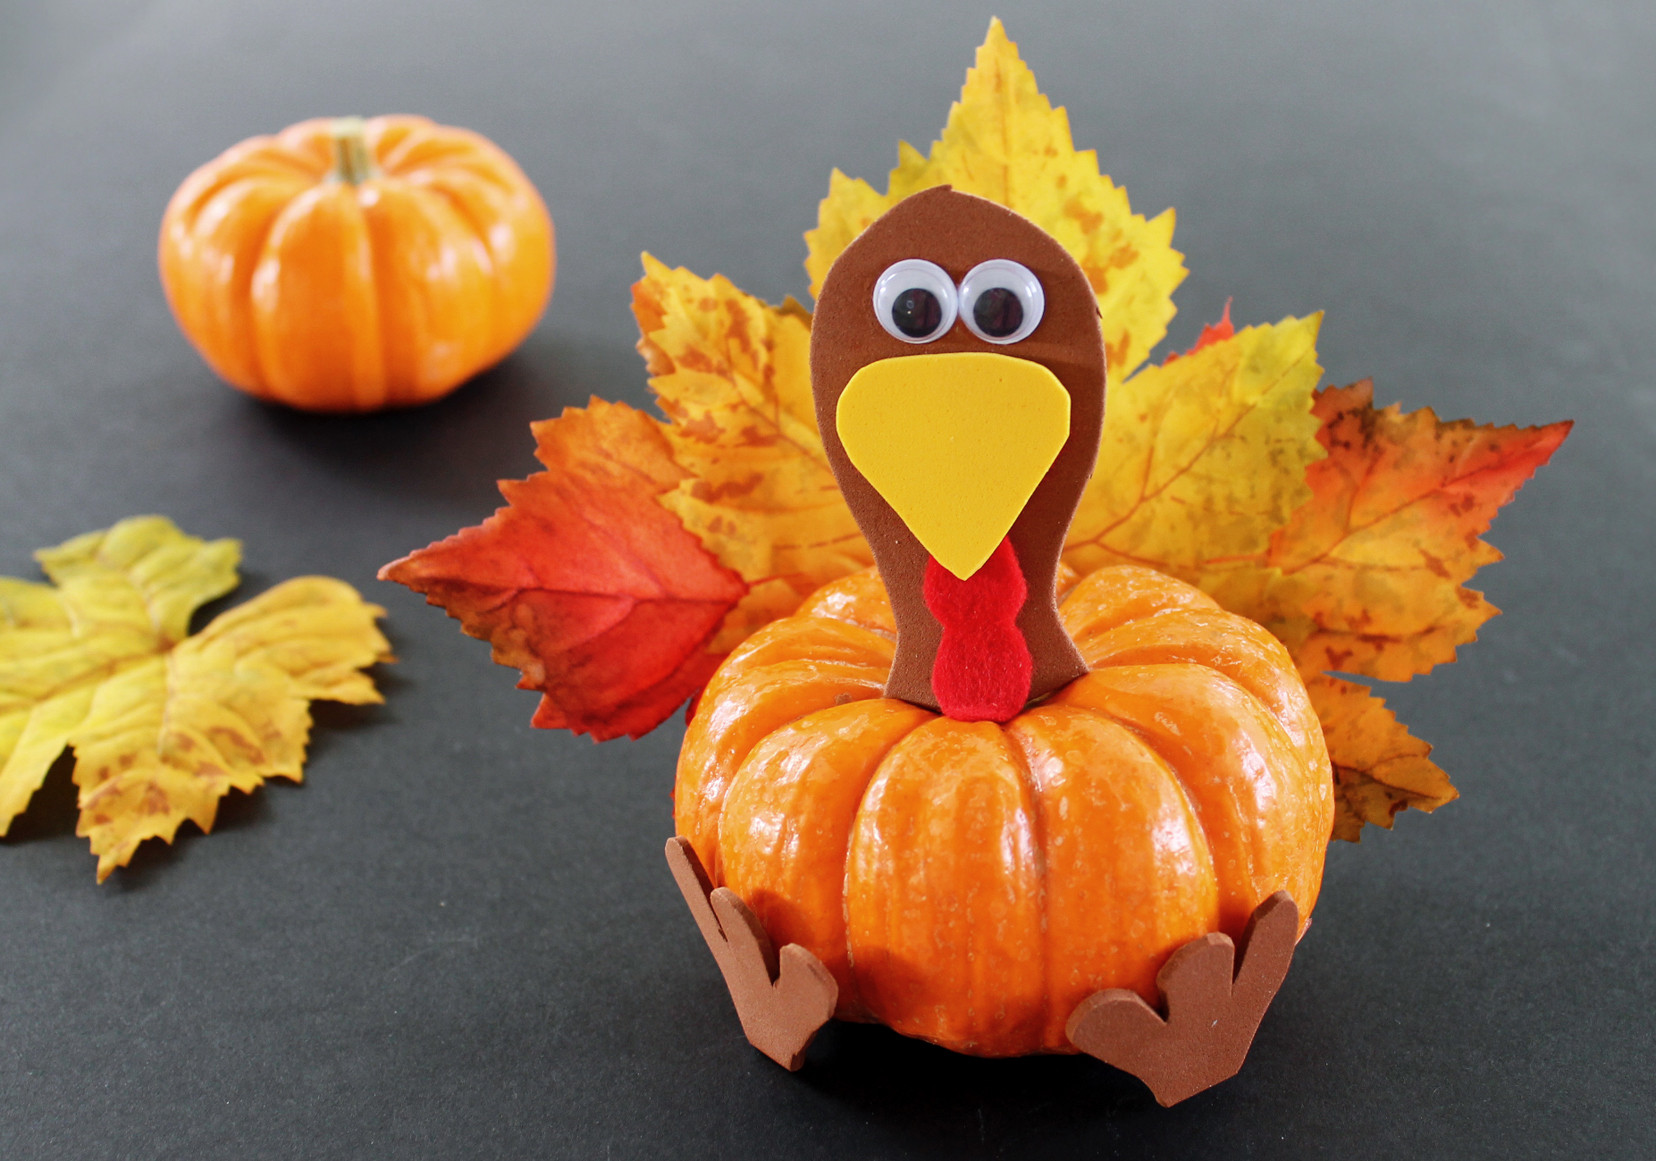 Turkey Crafts For Thanksgiving  Pumpkin Turkey Thanksgiving Craft for Kids Growing Up